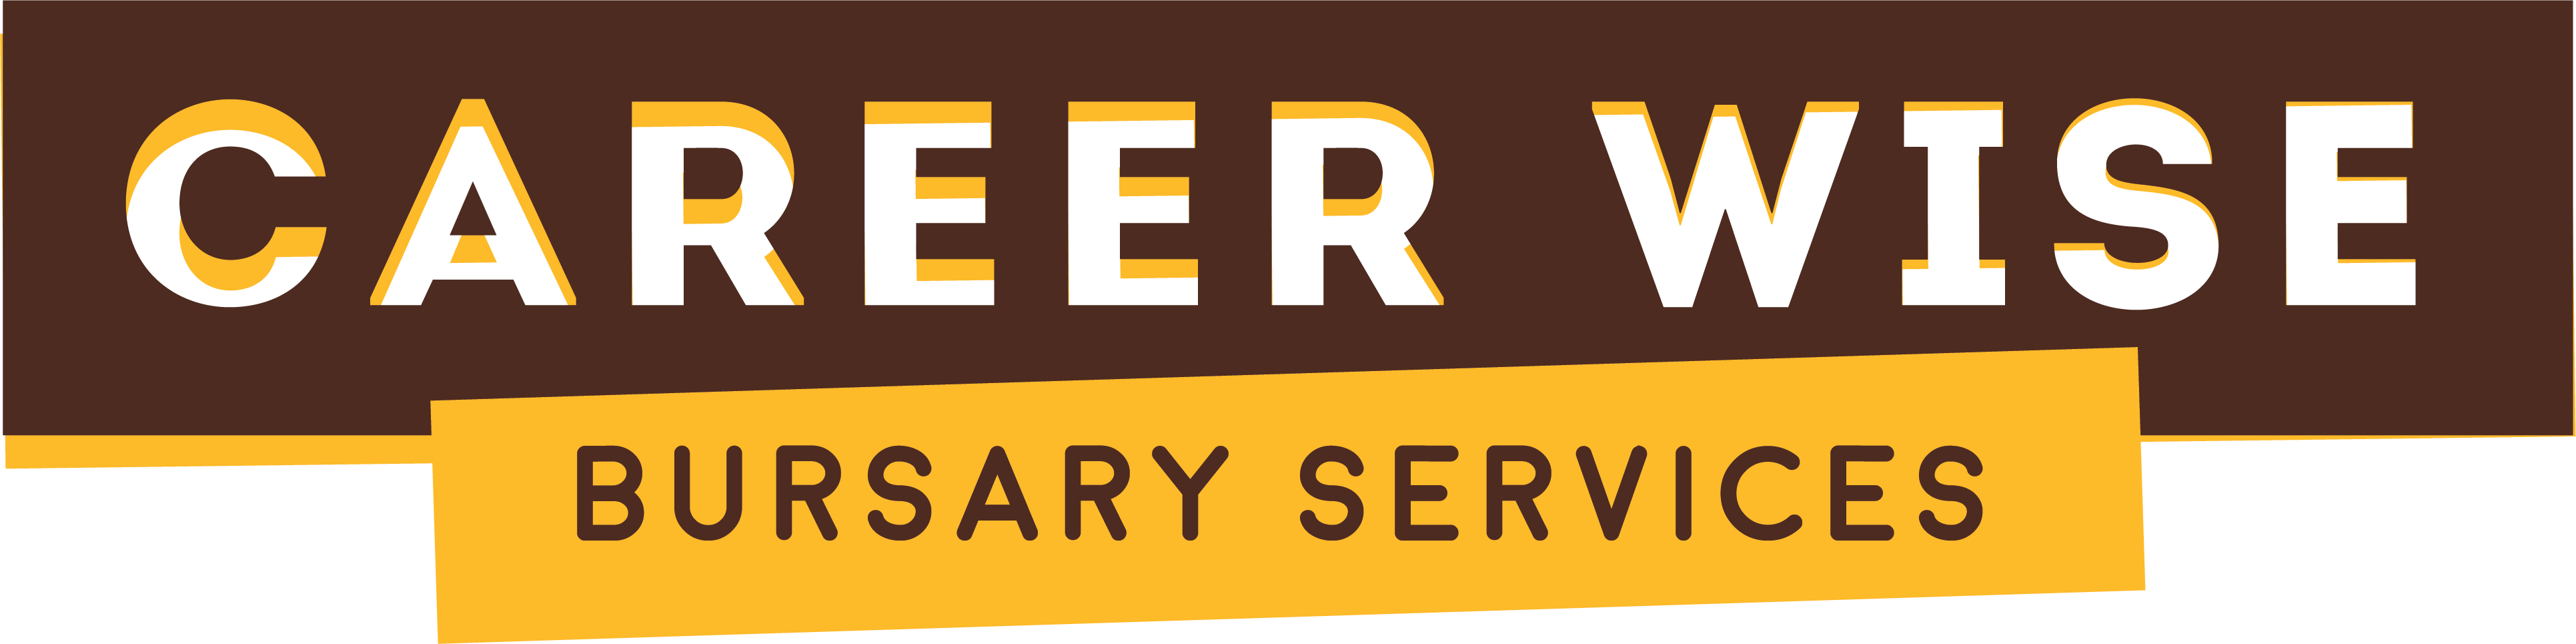 Career Wise Logo Typeface